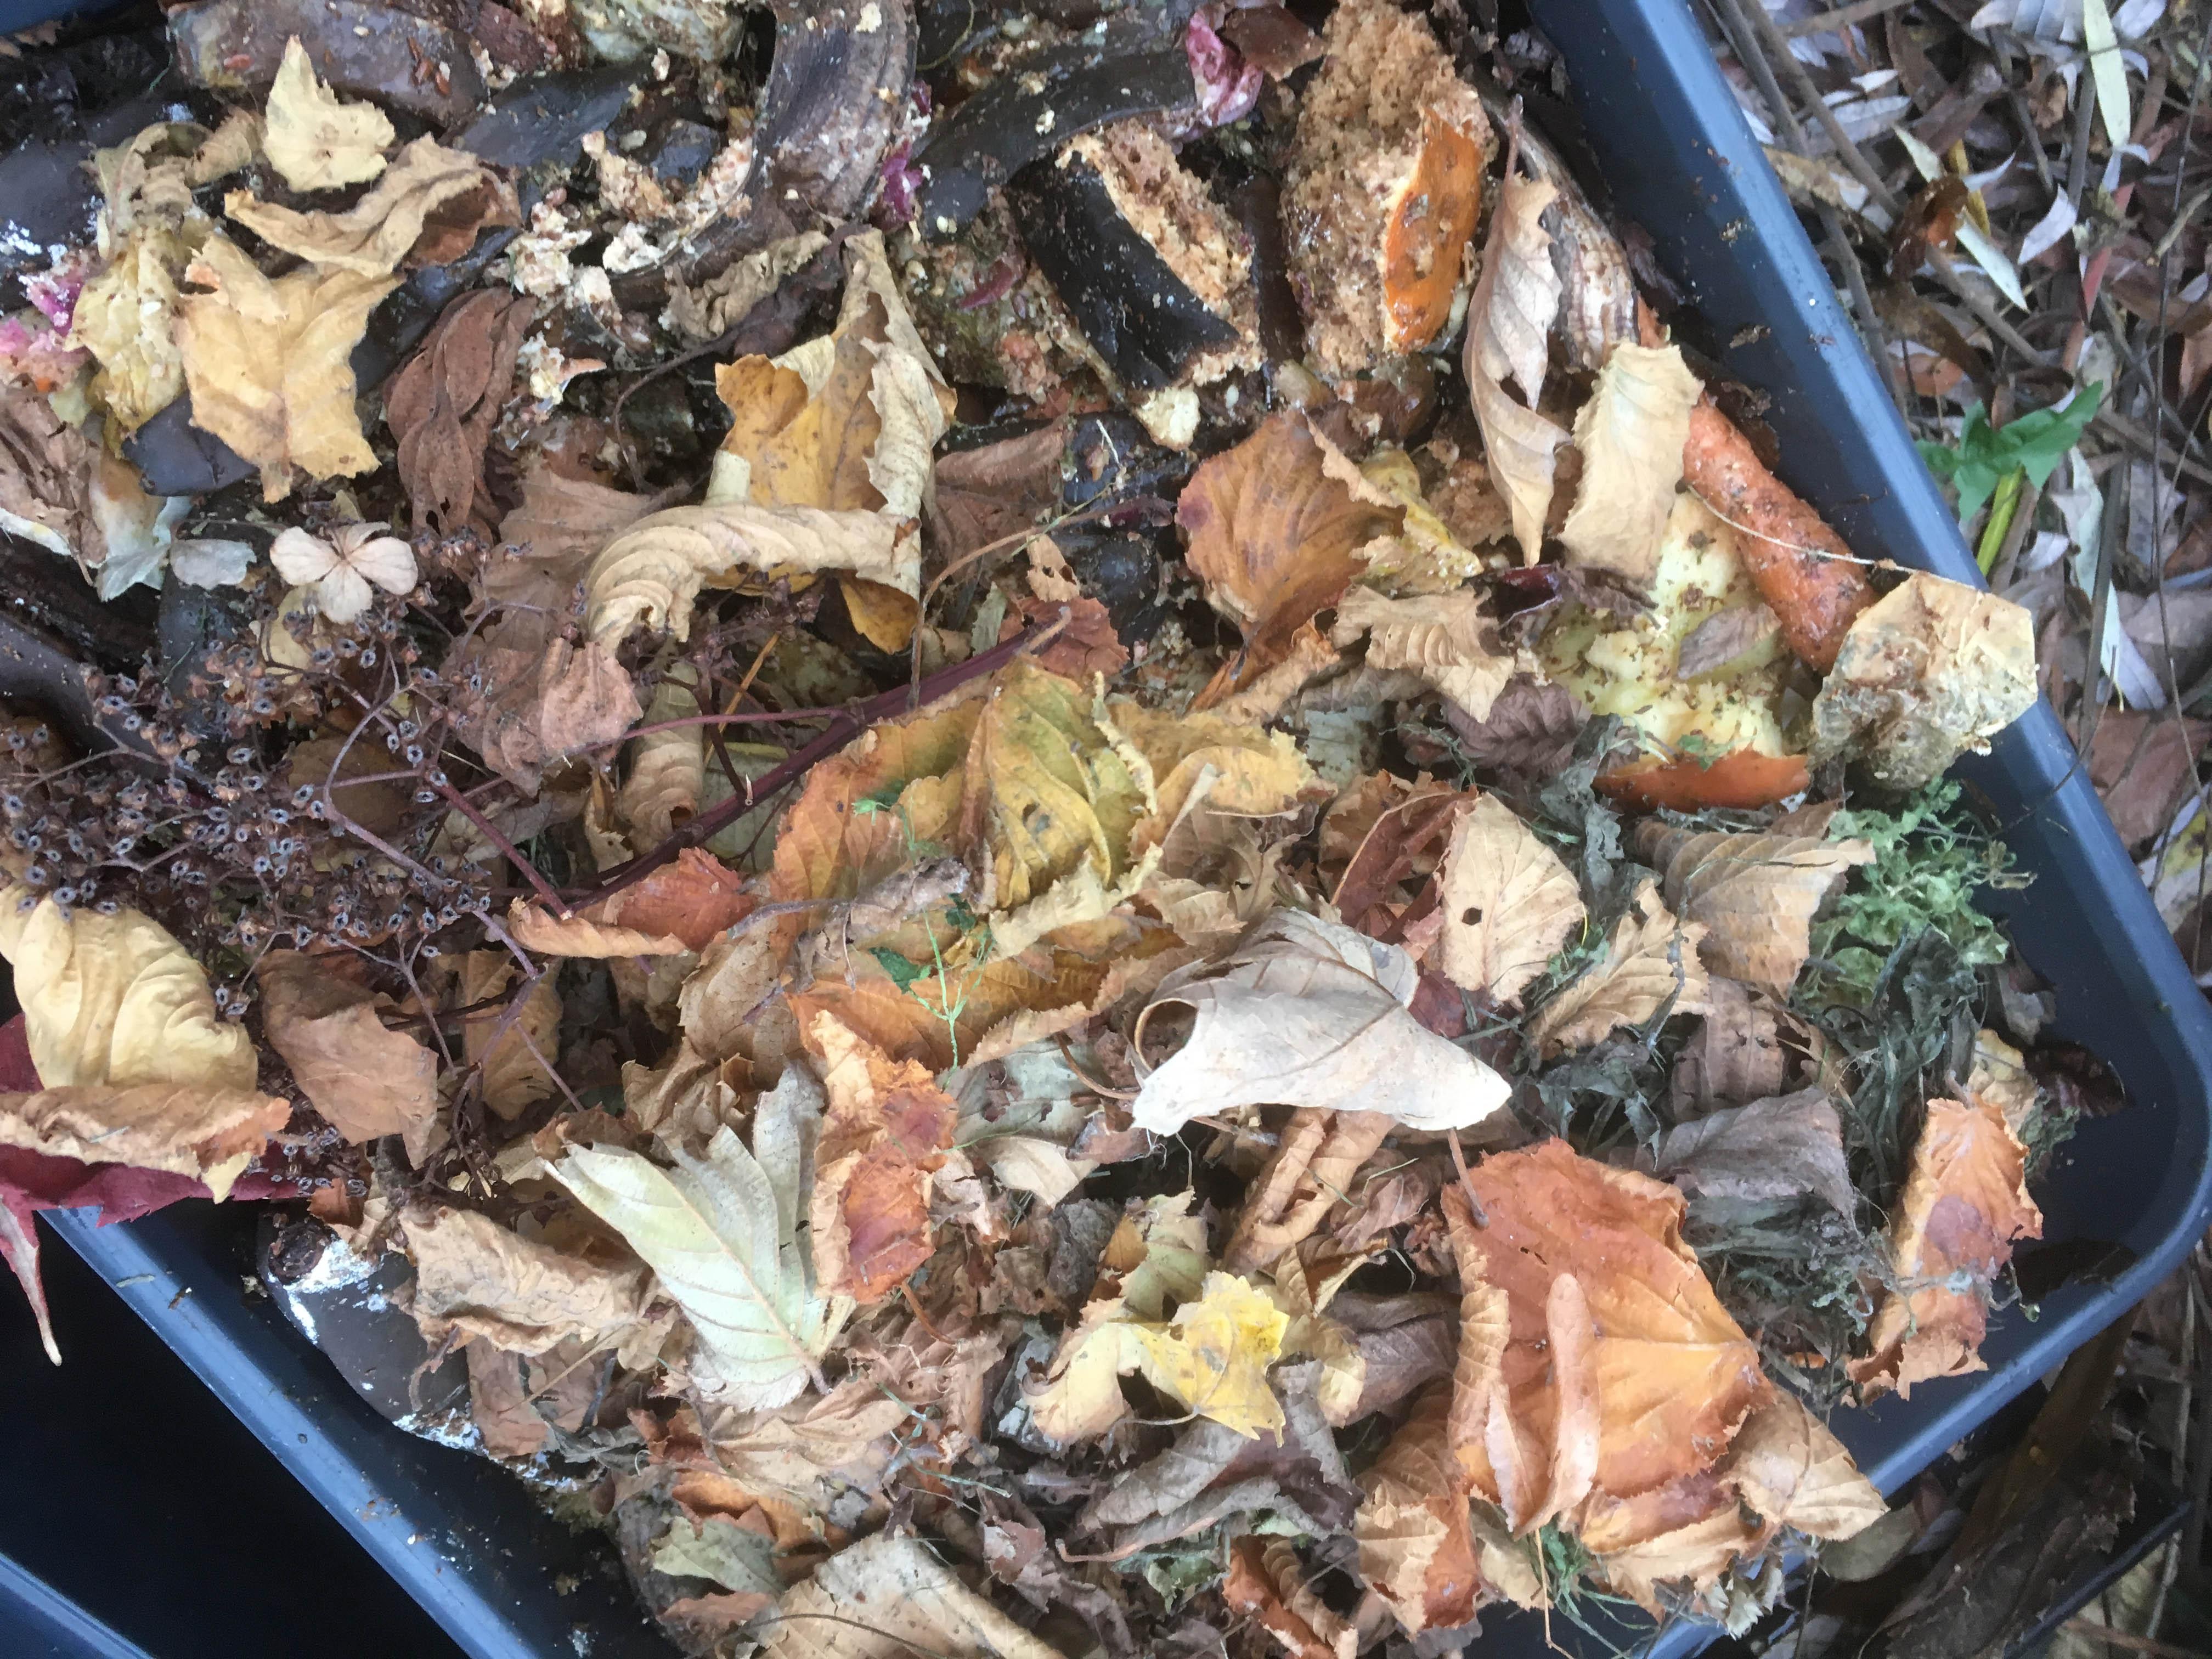 Blade i jordfabrikken